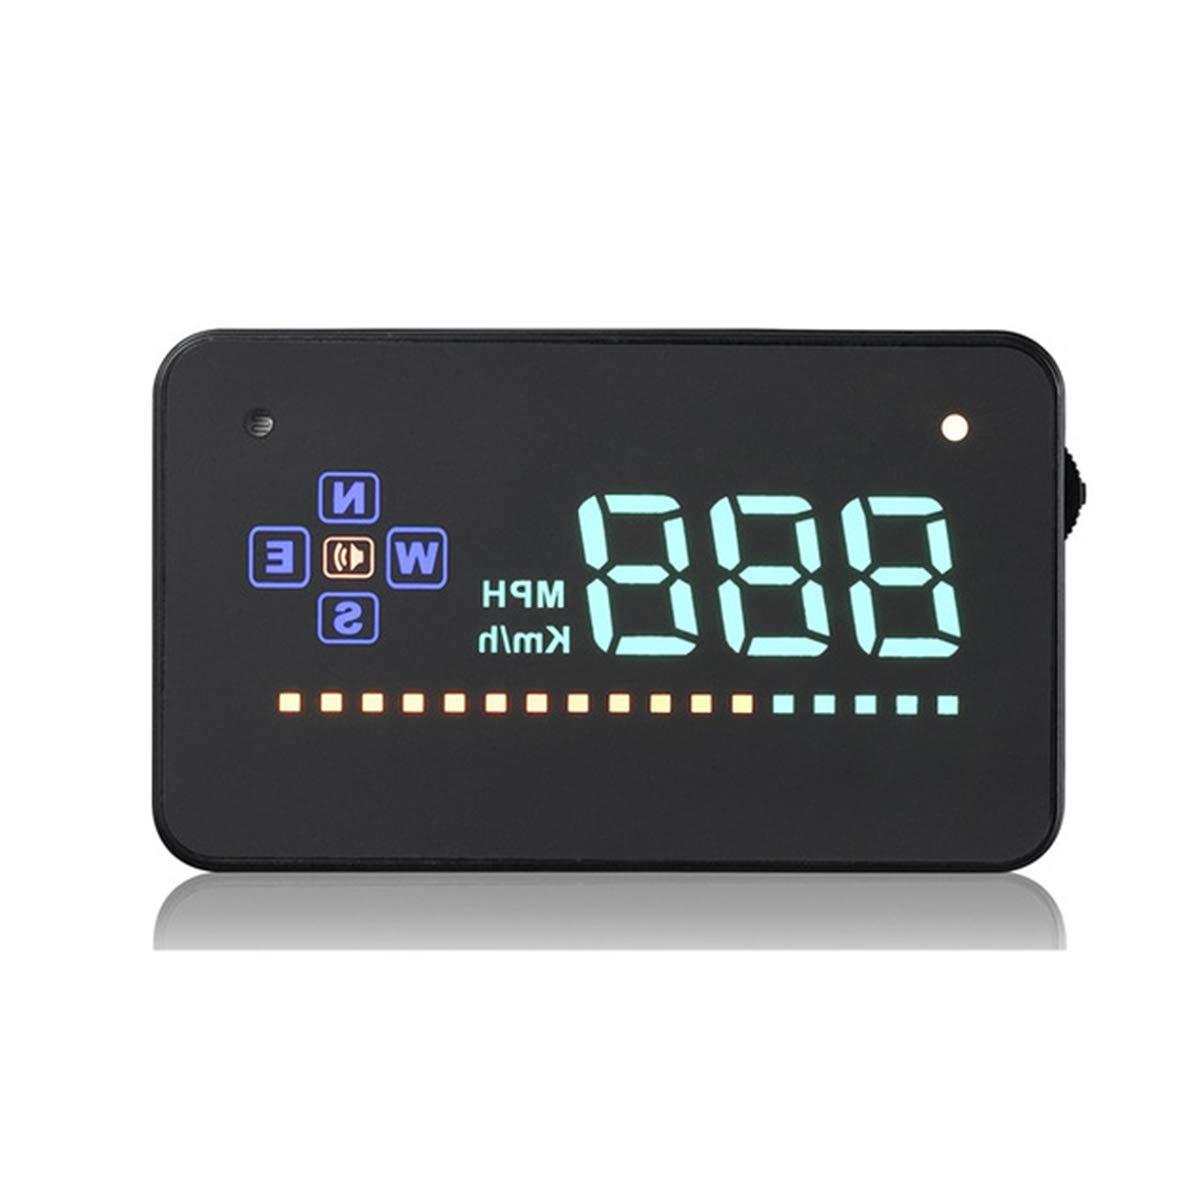 GOFORJUMP 3.5 Bildschirm Auto Fahrzeug GPS HUD Auto Head Up Display Tachometer Ü bergeschwindigkeitswarnung Windshiled Projector Alarm System